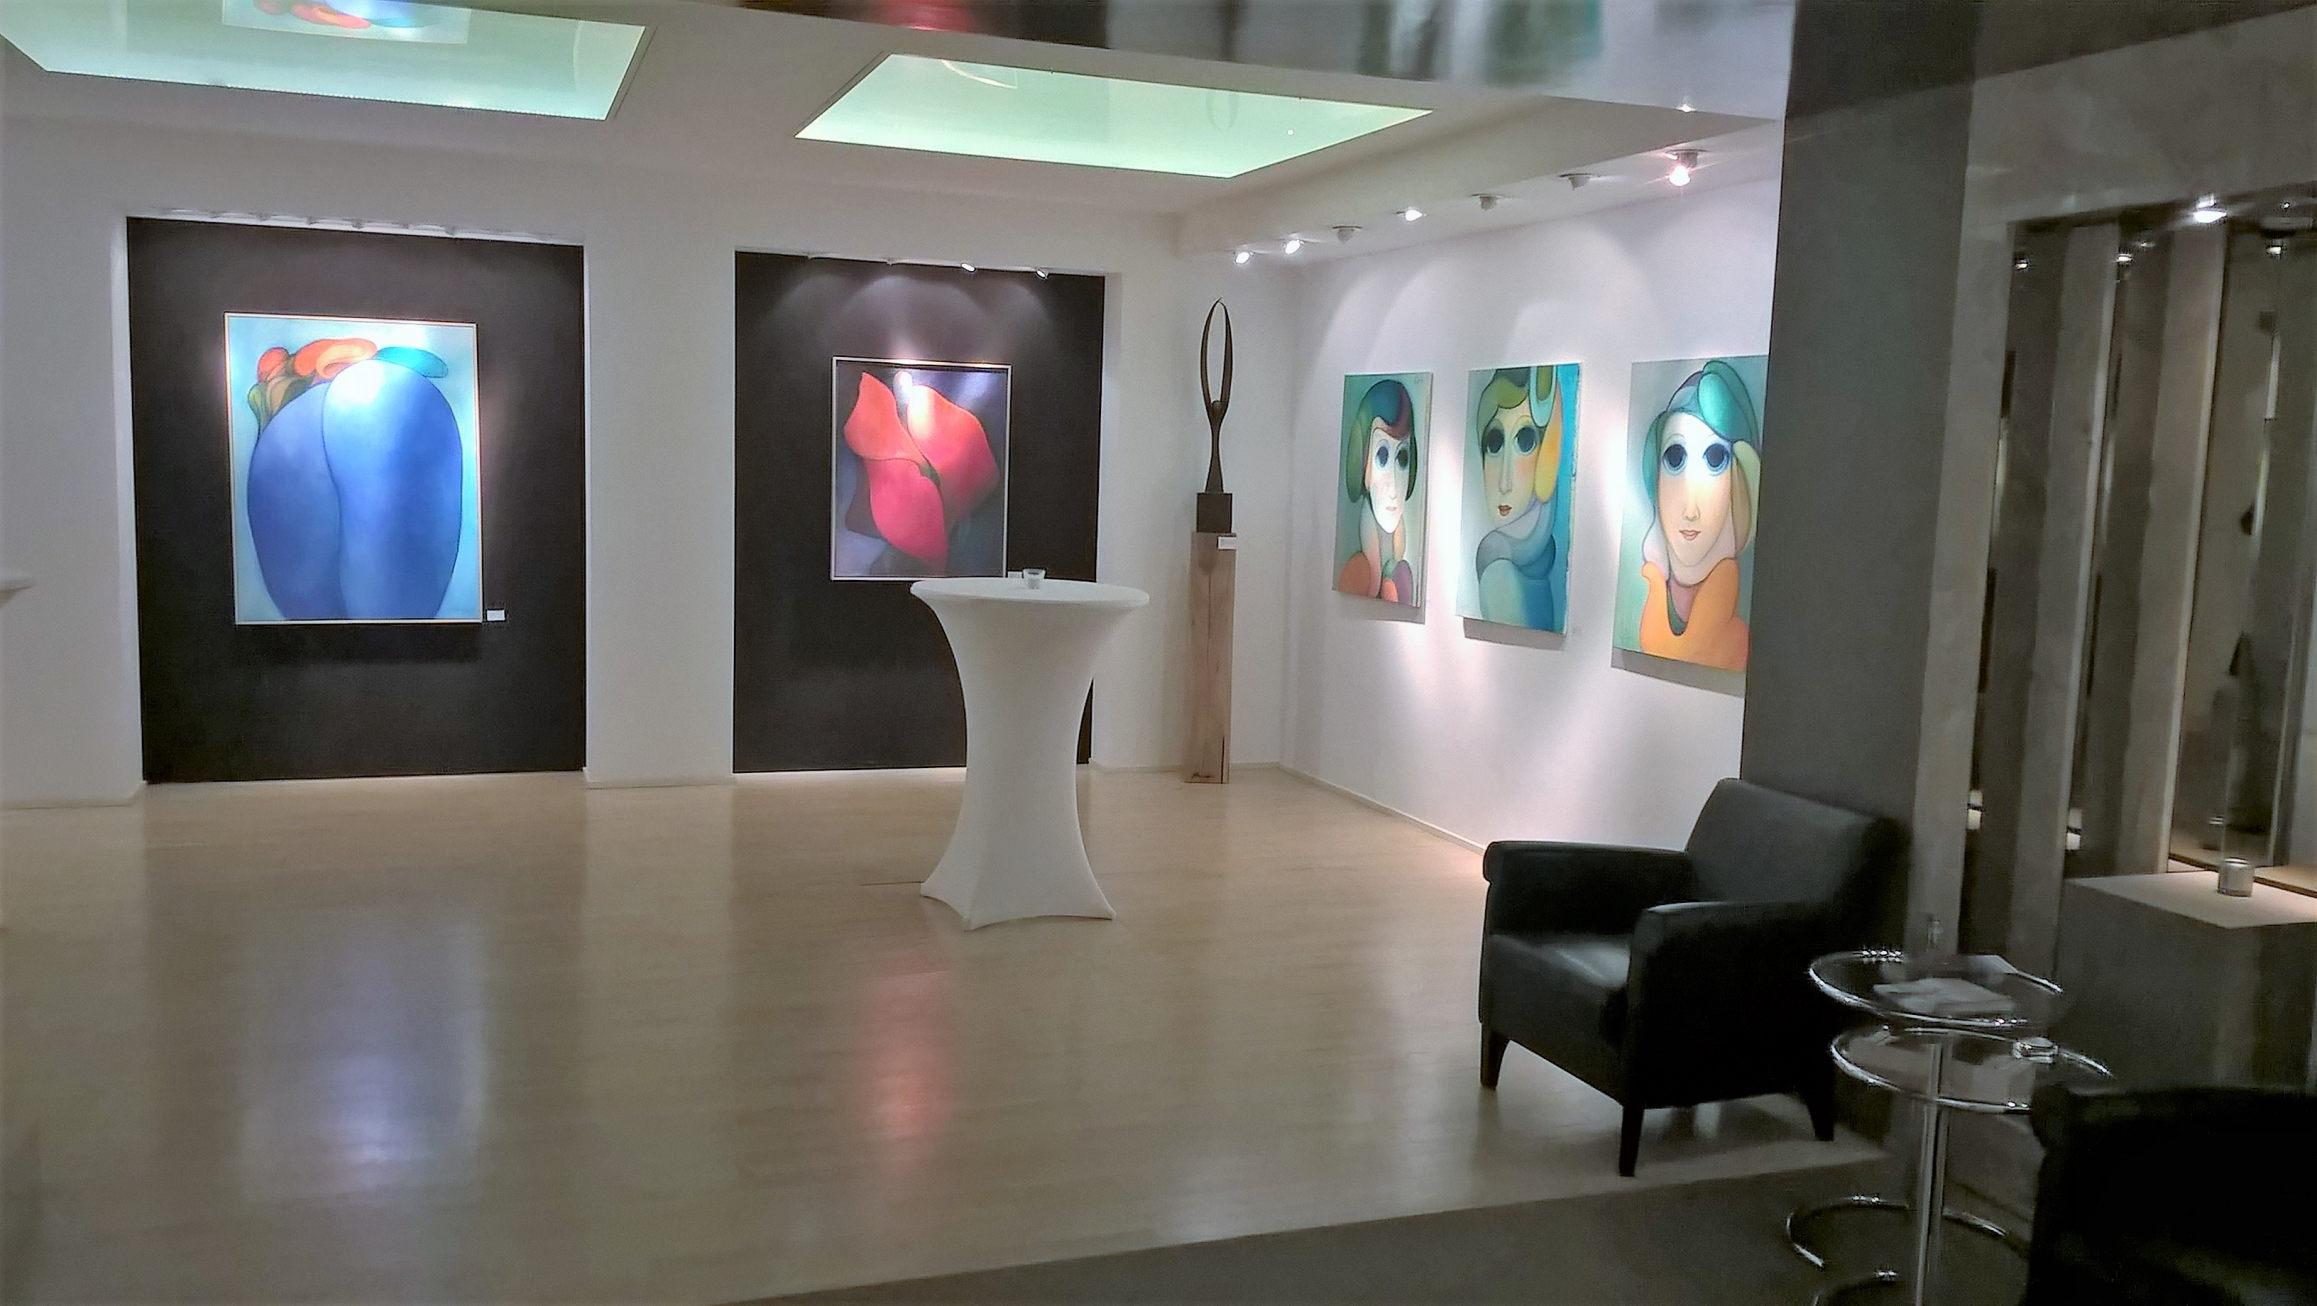 Reinhard Gäde Galerie Baumgartl Ausstellung 2017 1.jpg